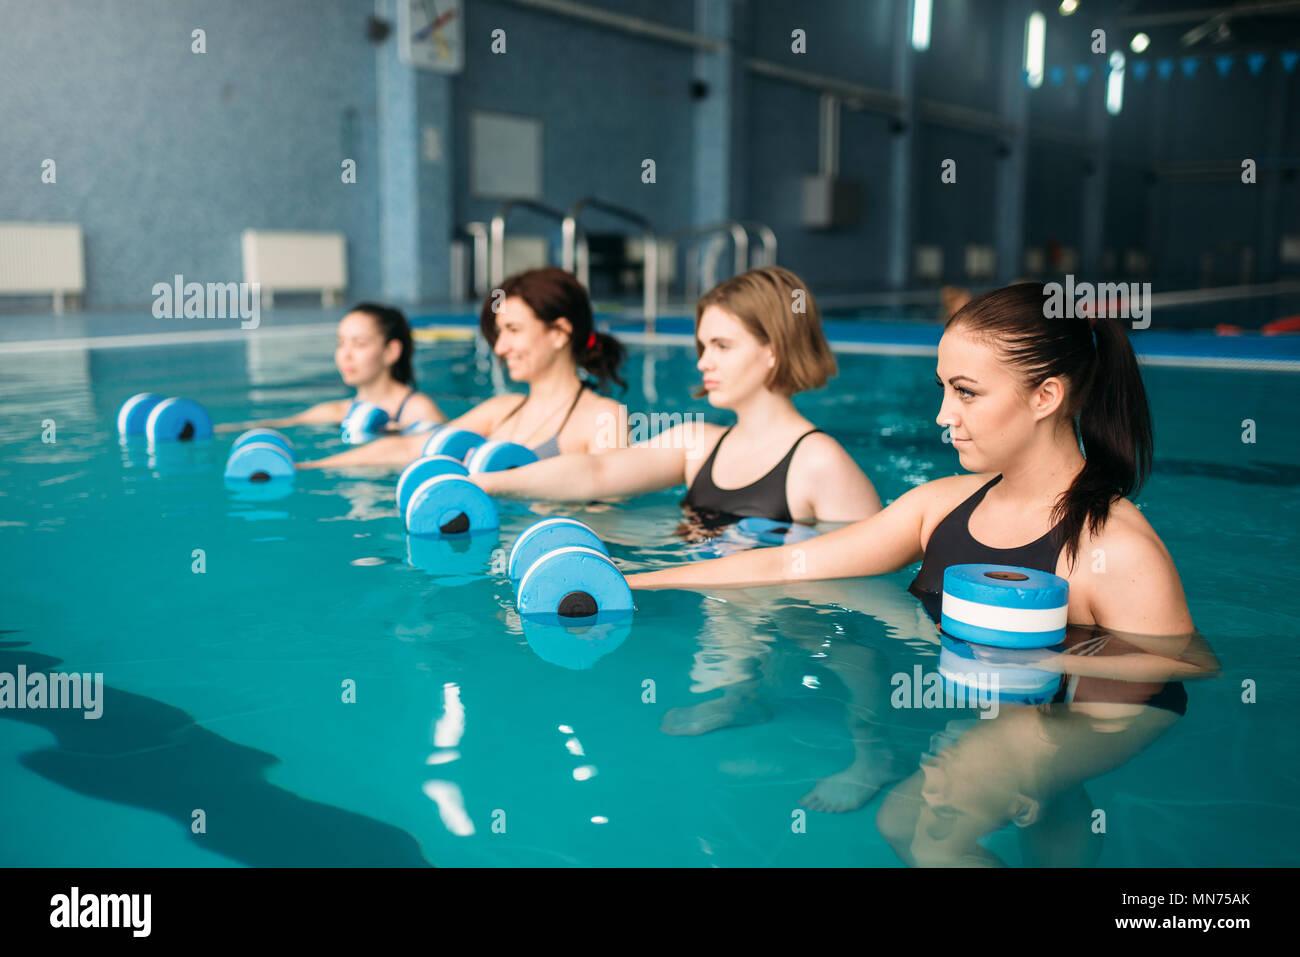 female group doing exercise with dumbbells on aqua aerobics workout